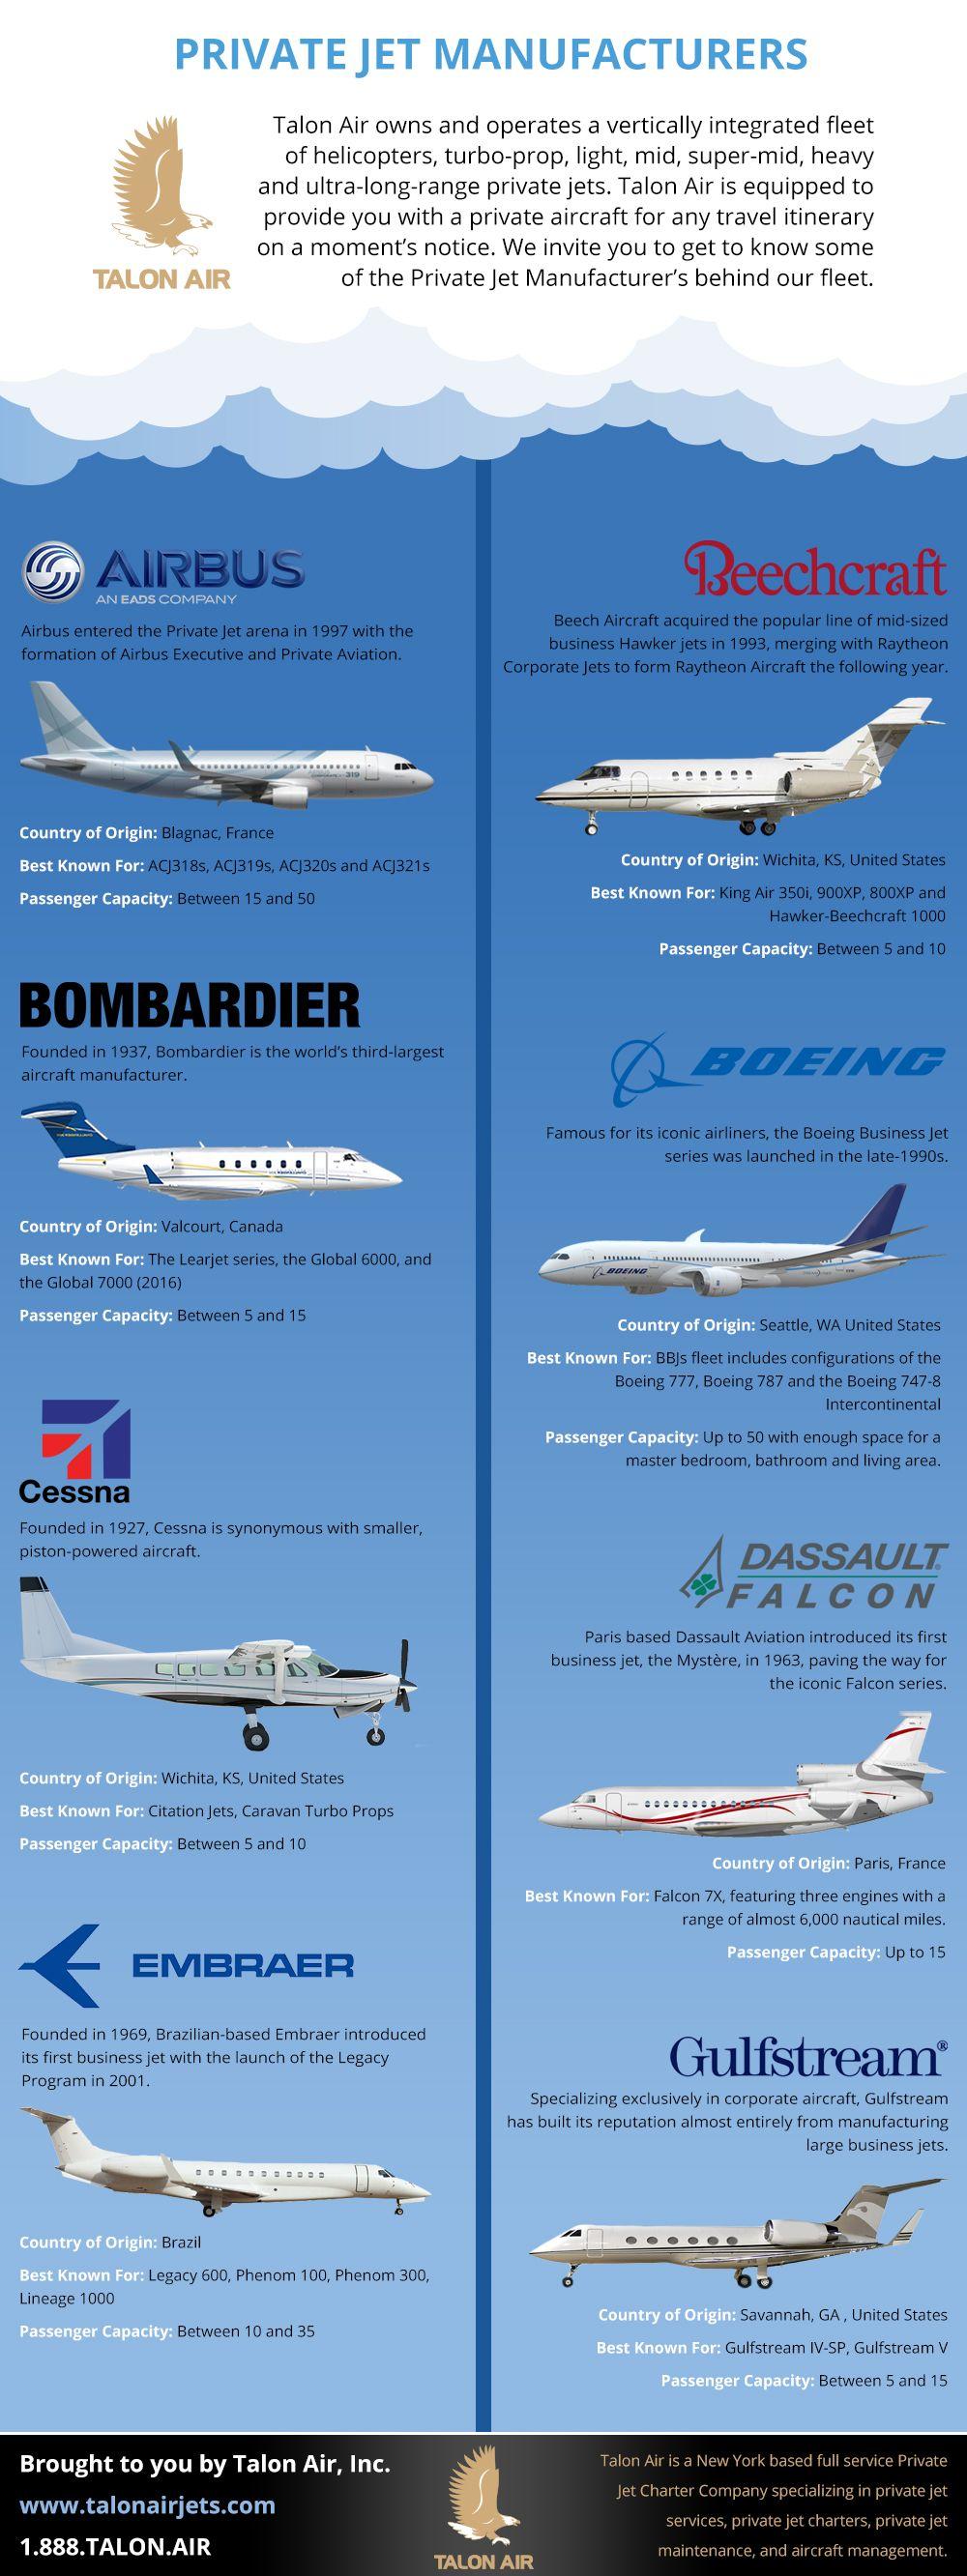 Phenom 300 cockpit phenom executive jet line leaders of innovation - Talonairjets Com Featuring Different Private Jet Manufacturers